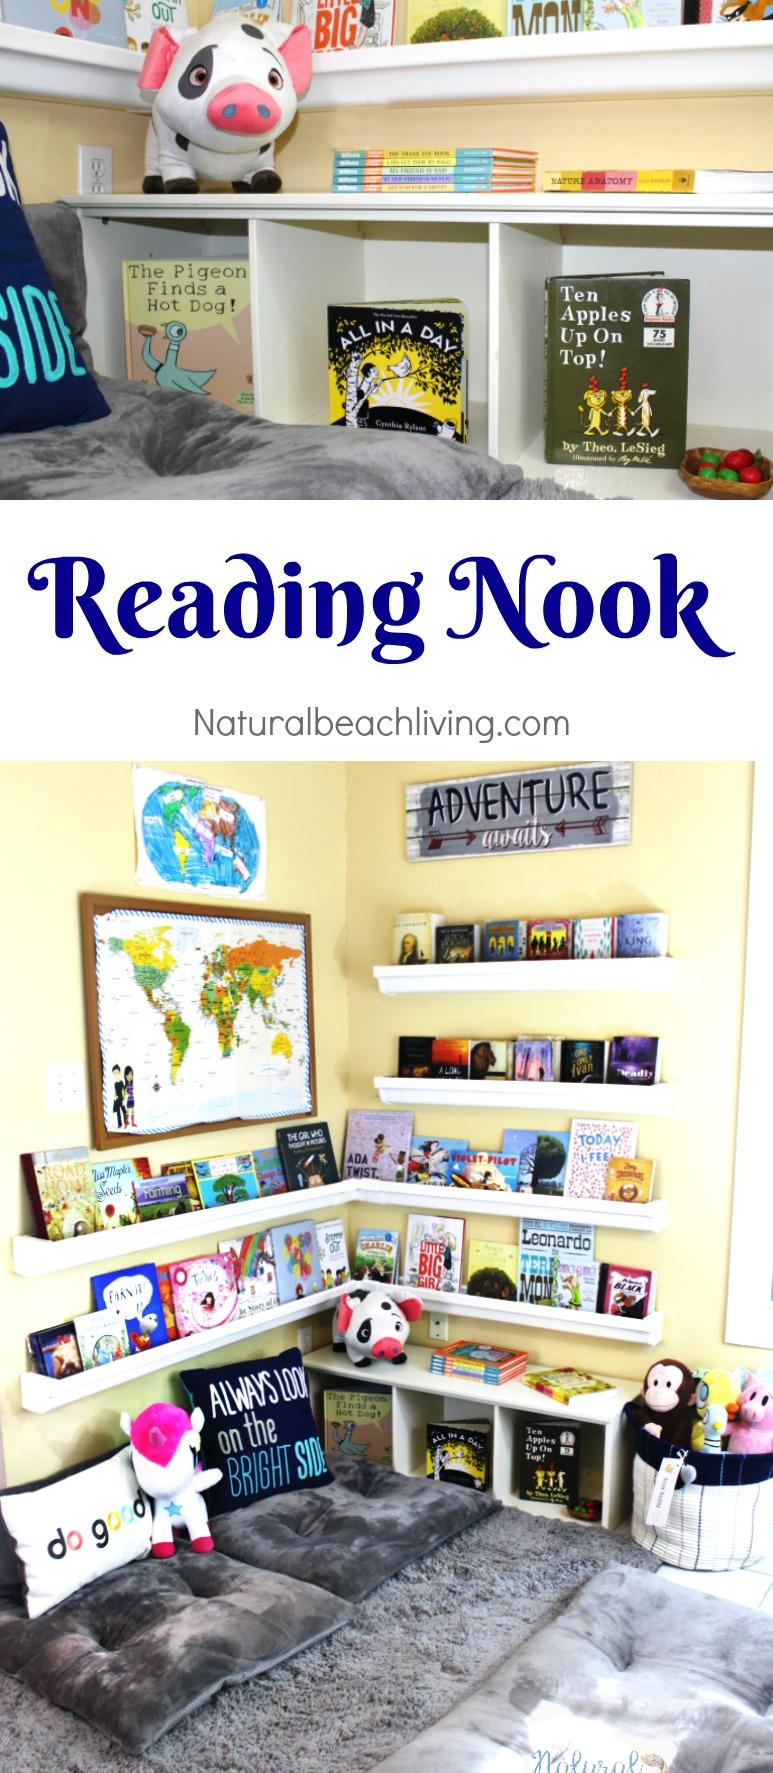 How To Set Up A Reading Nook Kids Love Plus Diy Rain Gutter